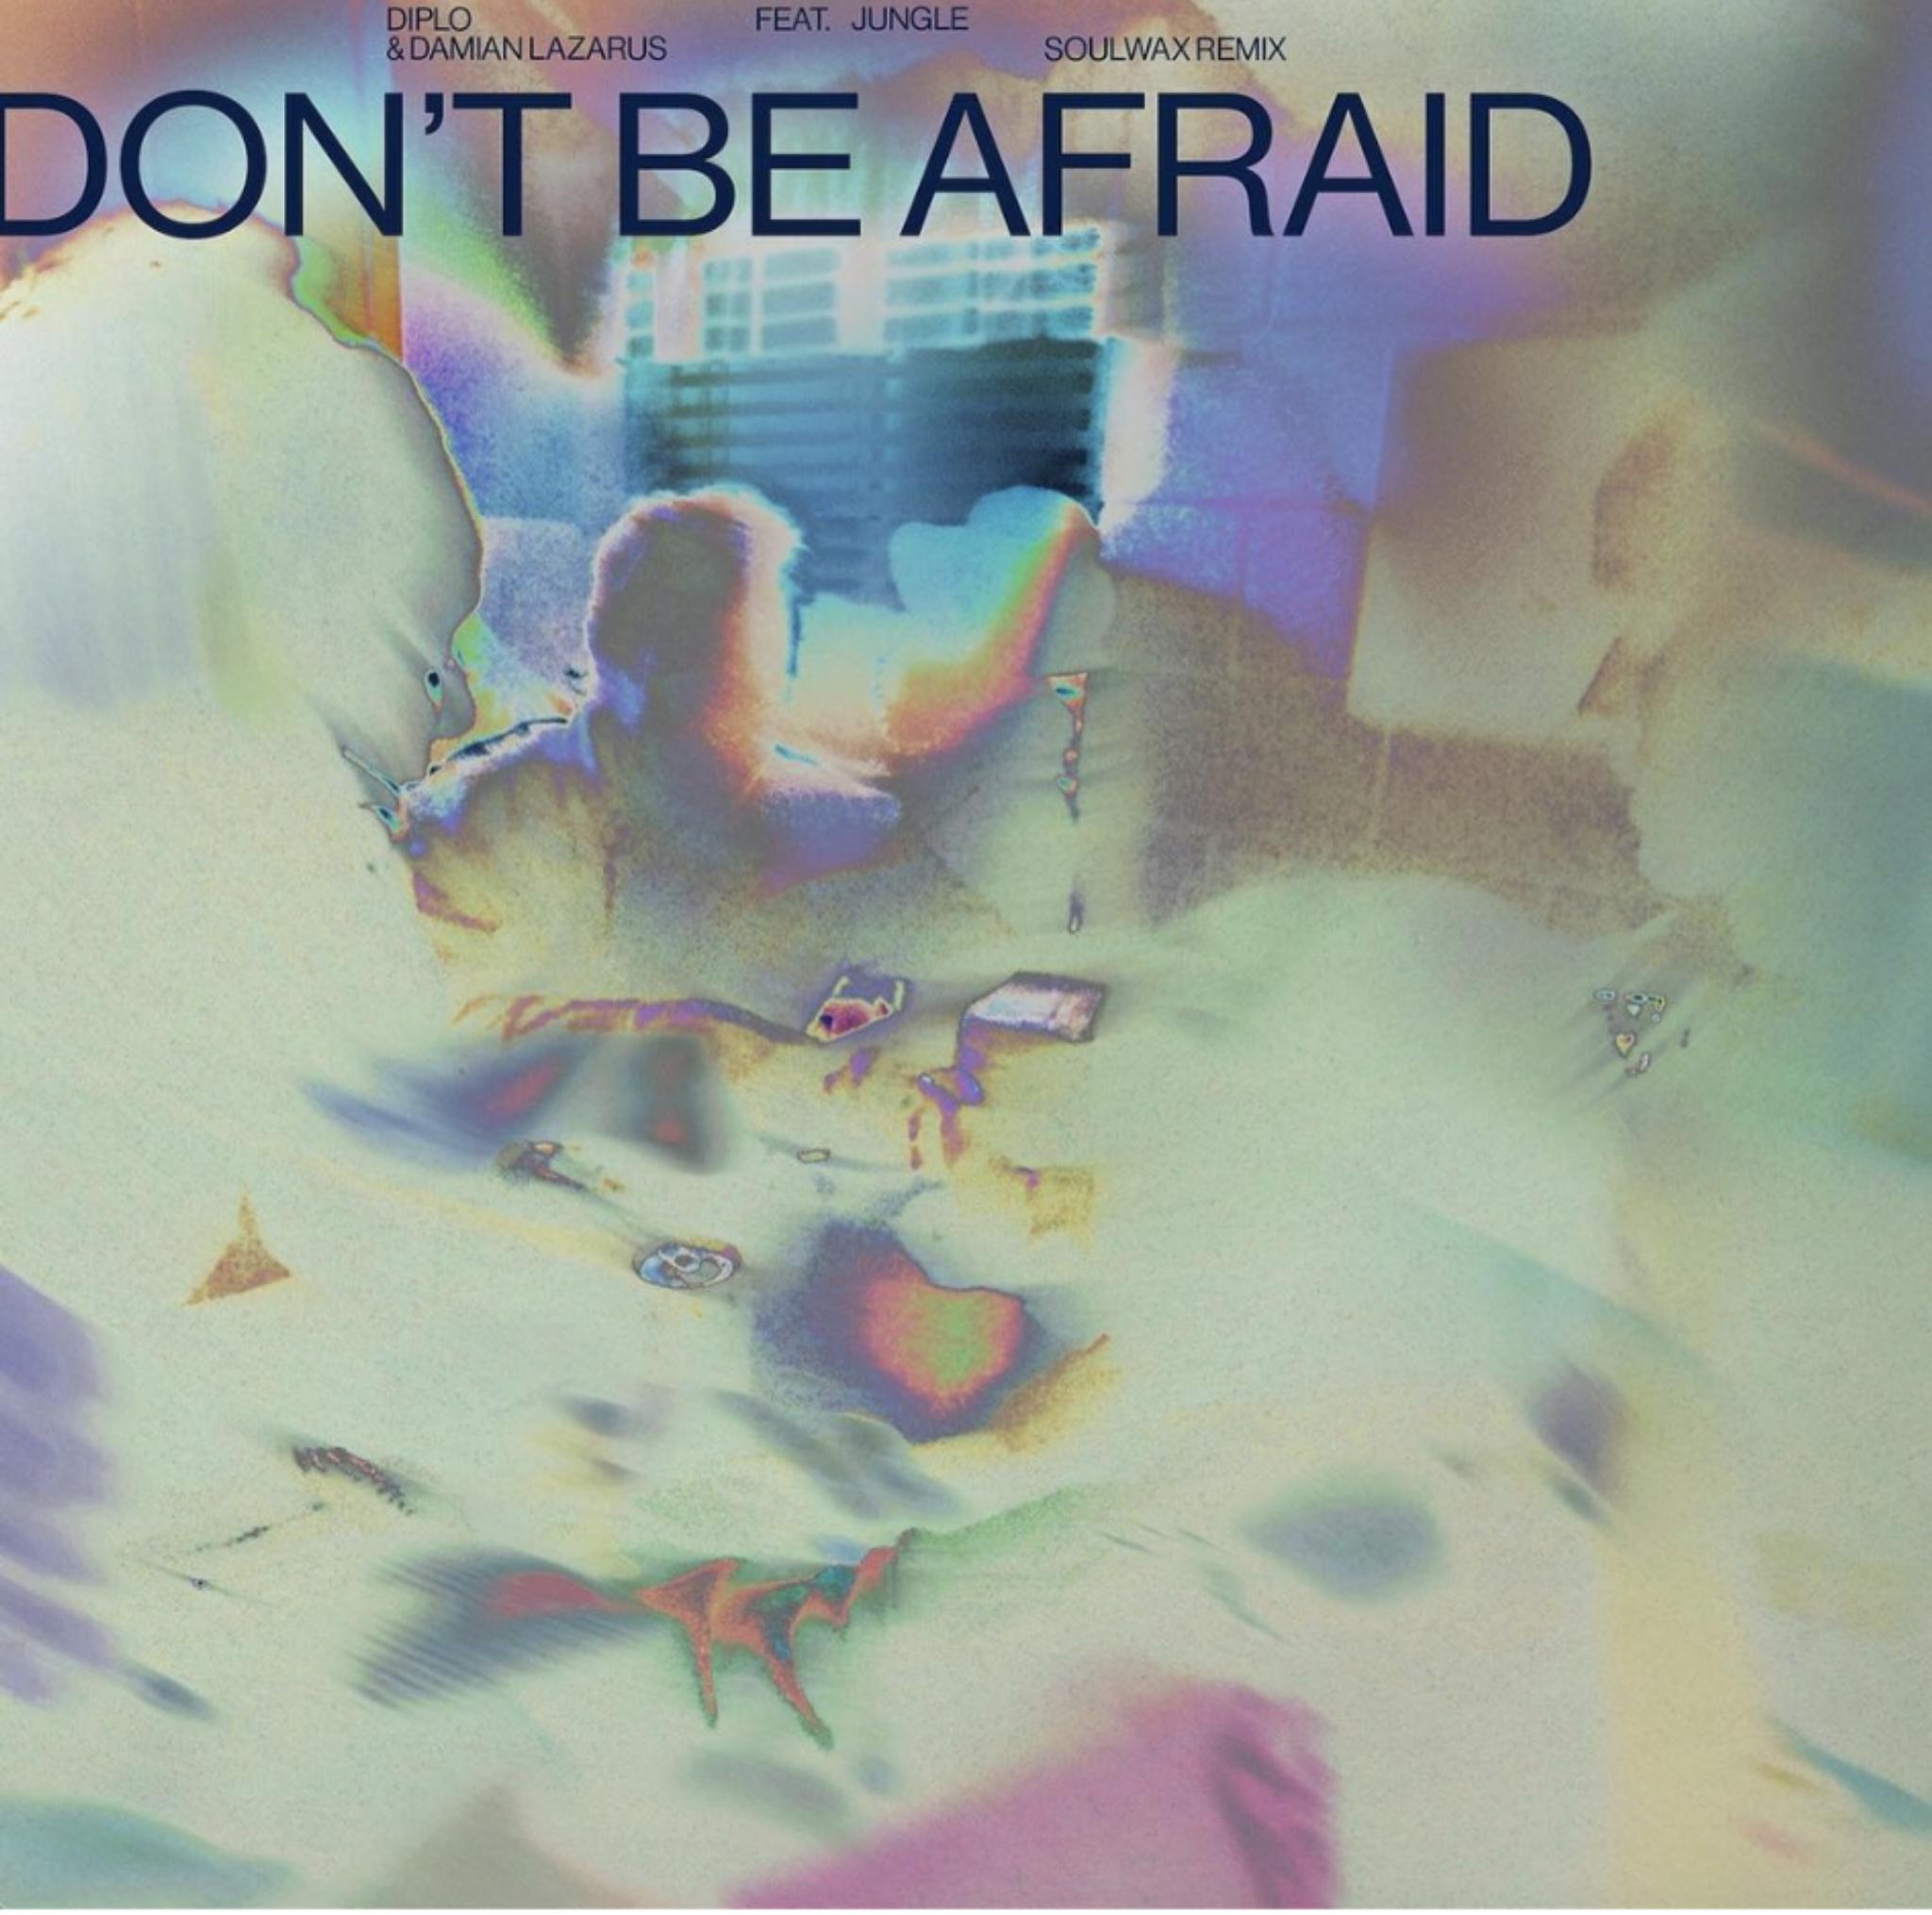 Diplo feat. Jungle – Don't Be Afraid (Soulwax Remix)